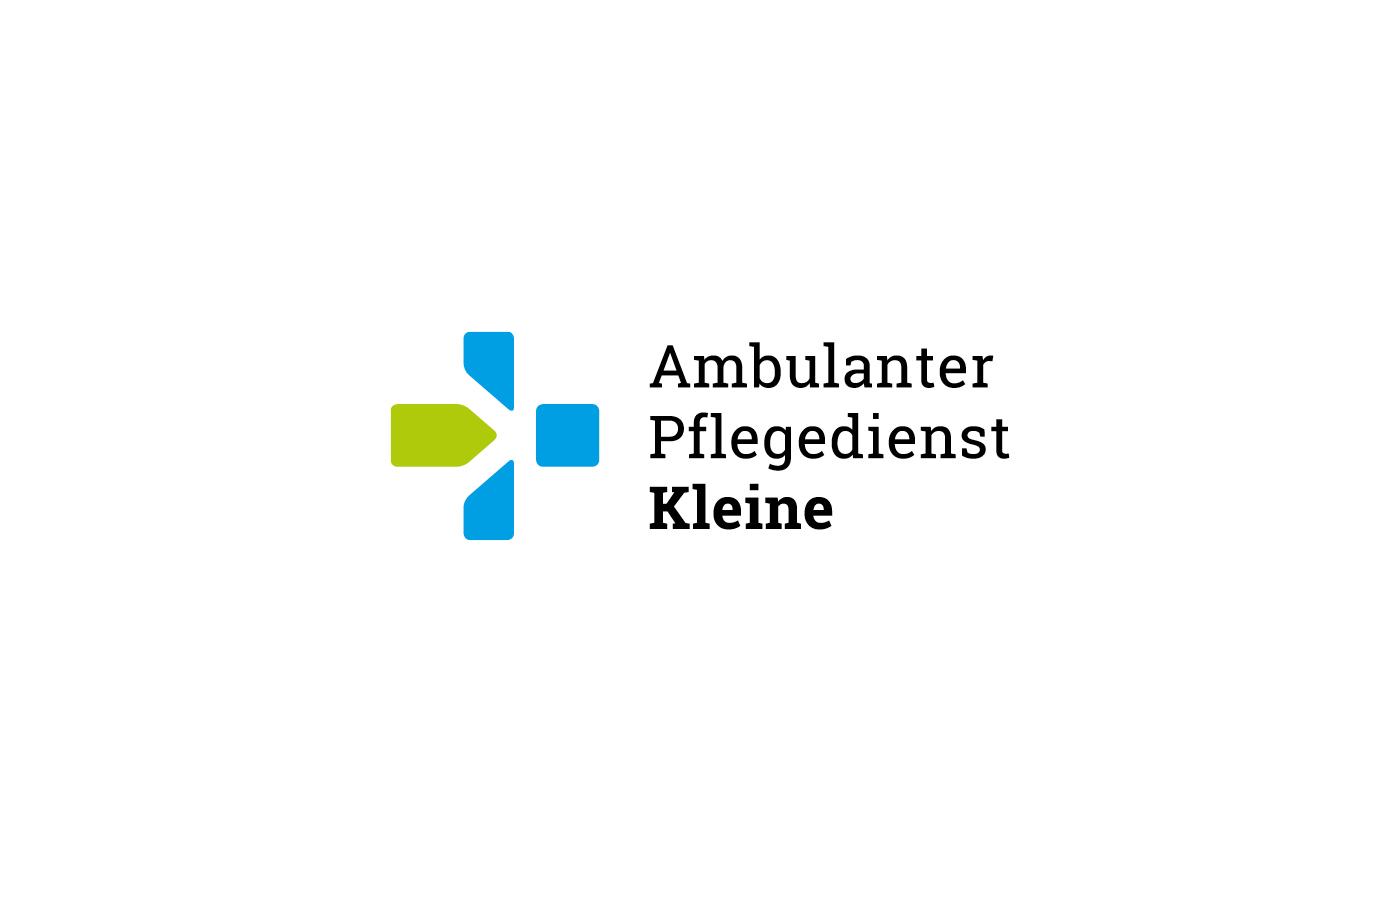 apk_logo1.jpg